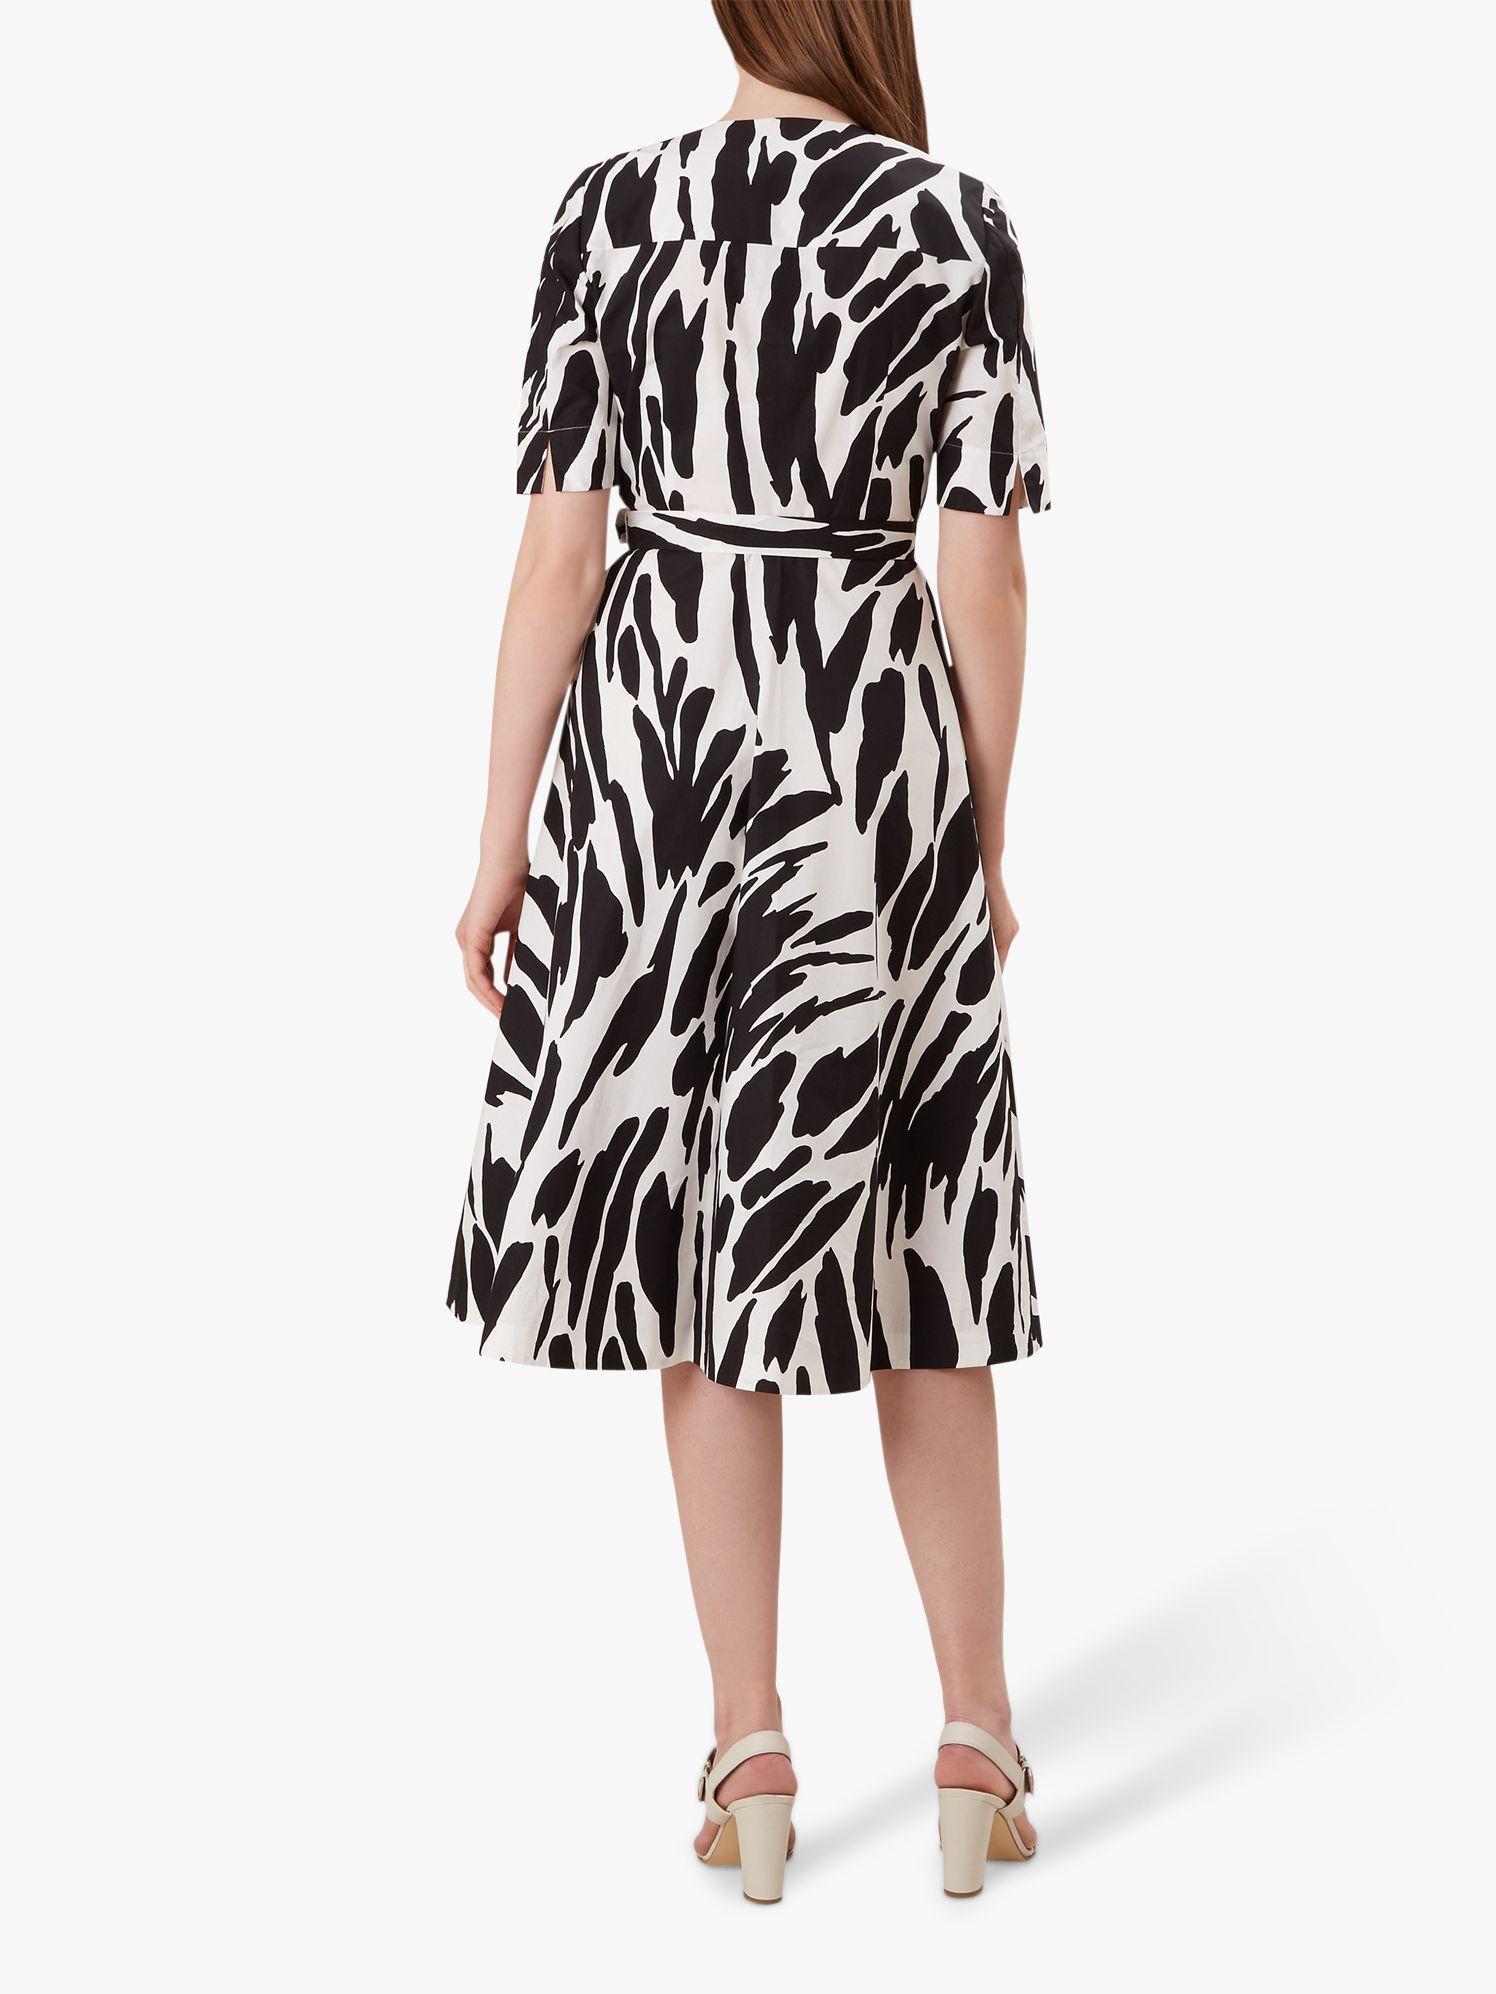 RRP £99. Hobbs Justina Black Ivory Dress Various Sizes